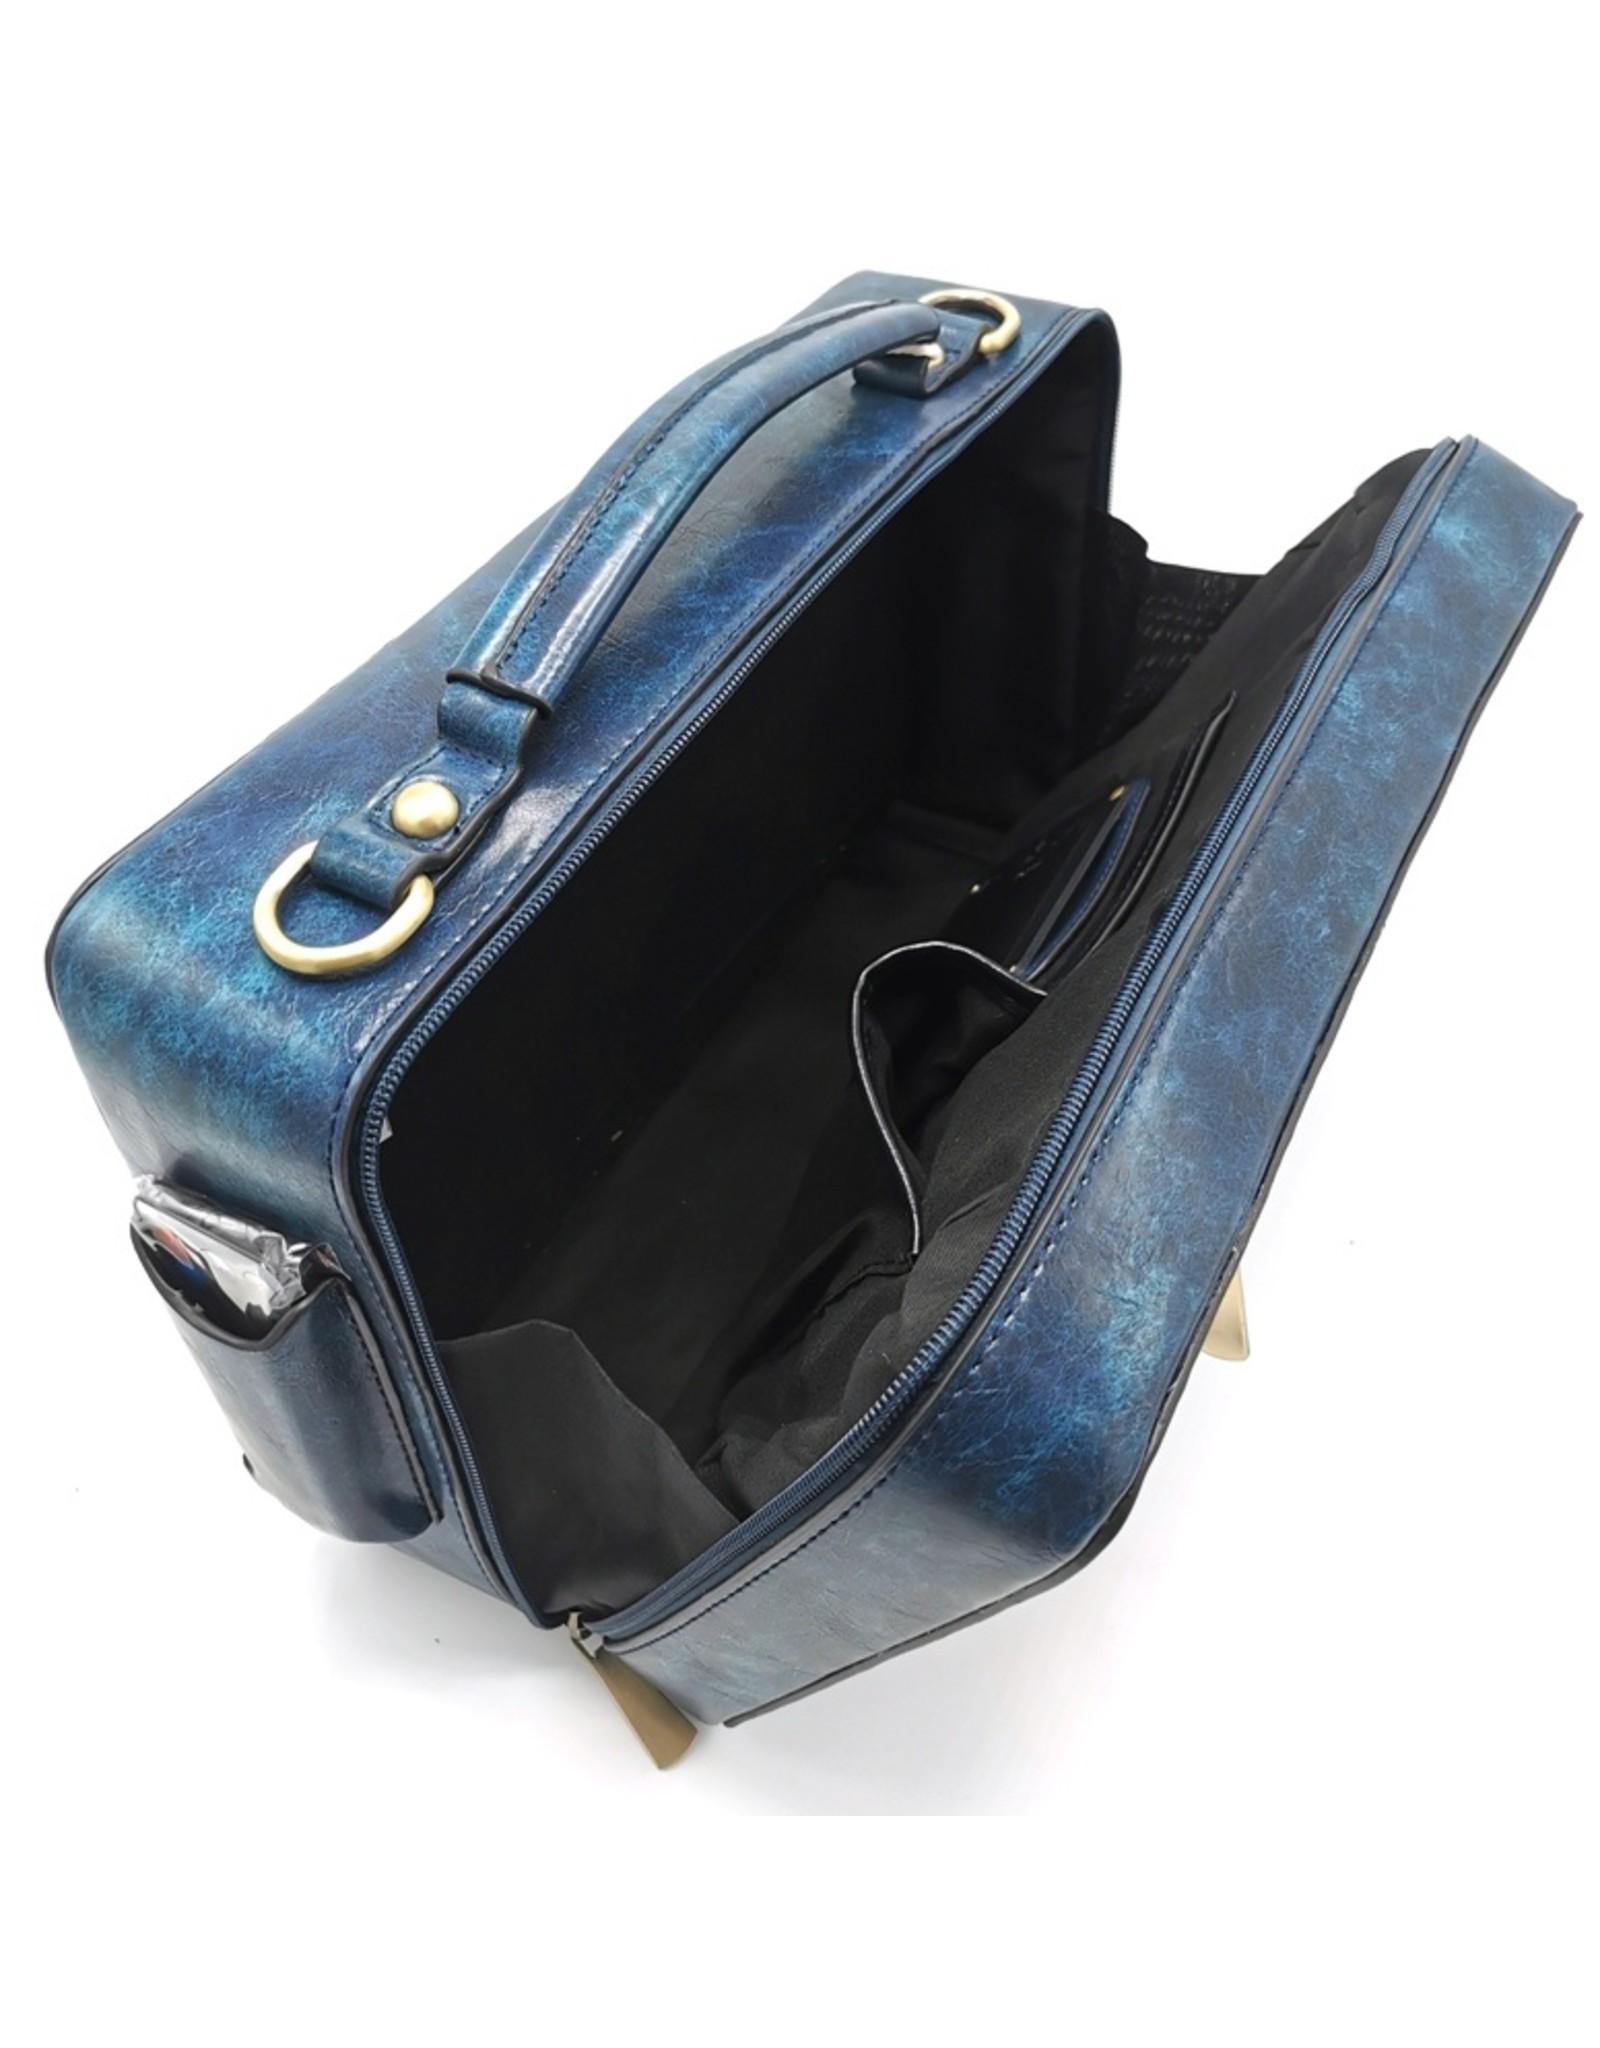 Eliox Fantasy bags and wallets - Boombox Retro Radio Handbag with Real Radio blue